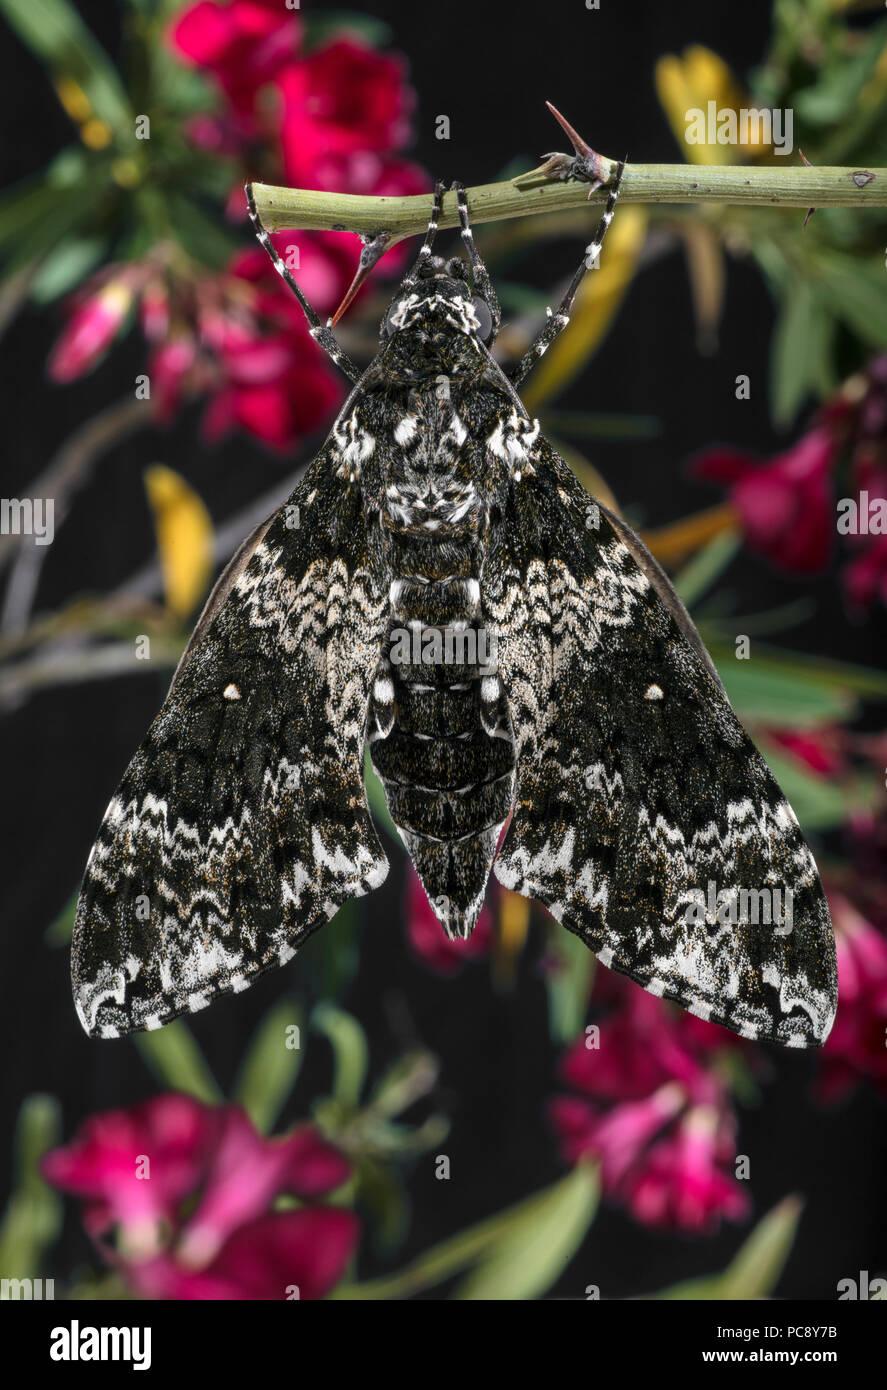 Rustic Sphinx Moth Newly Emerged & Pumping Up Wings Manduca rustica rustica dorsal - Stock Image